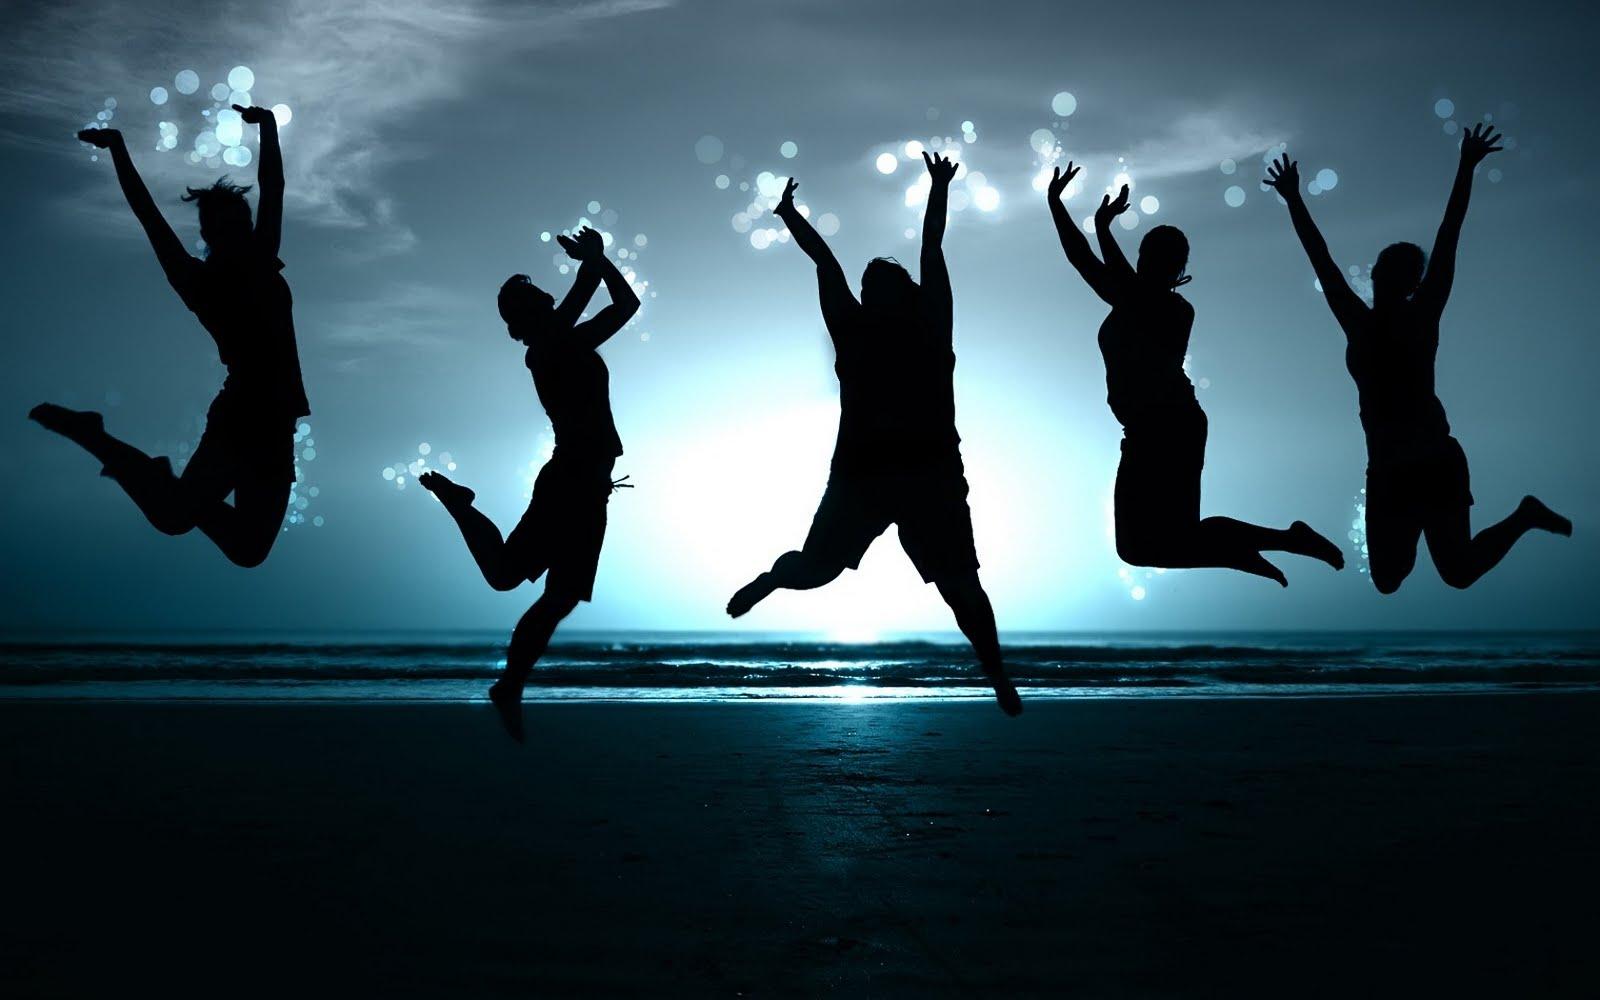 Perilaku Remaja 2013 Riskesdas 2013 Slideshare Perilaku Remaja Yang Berisiko Terhadap Kesehatan Aku Kamu Kita